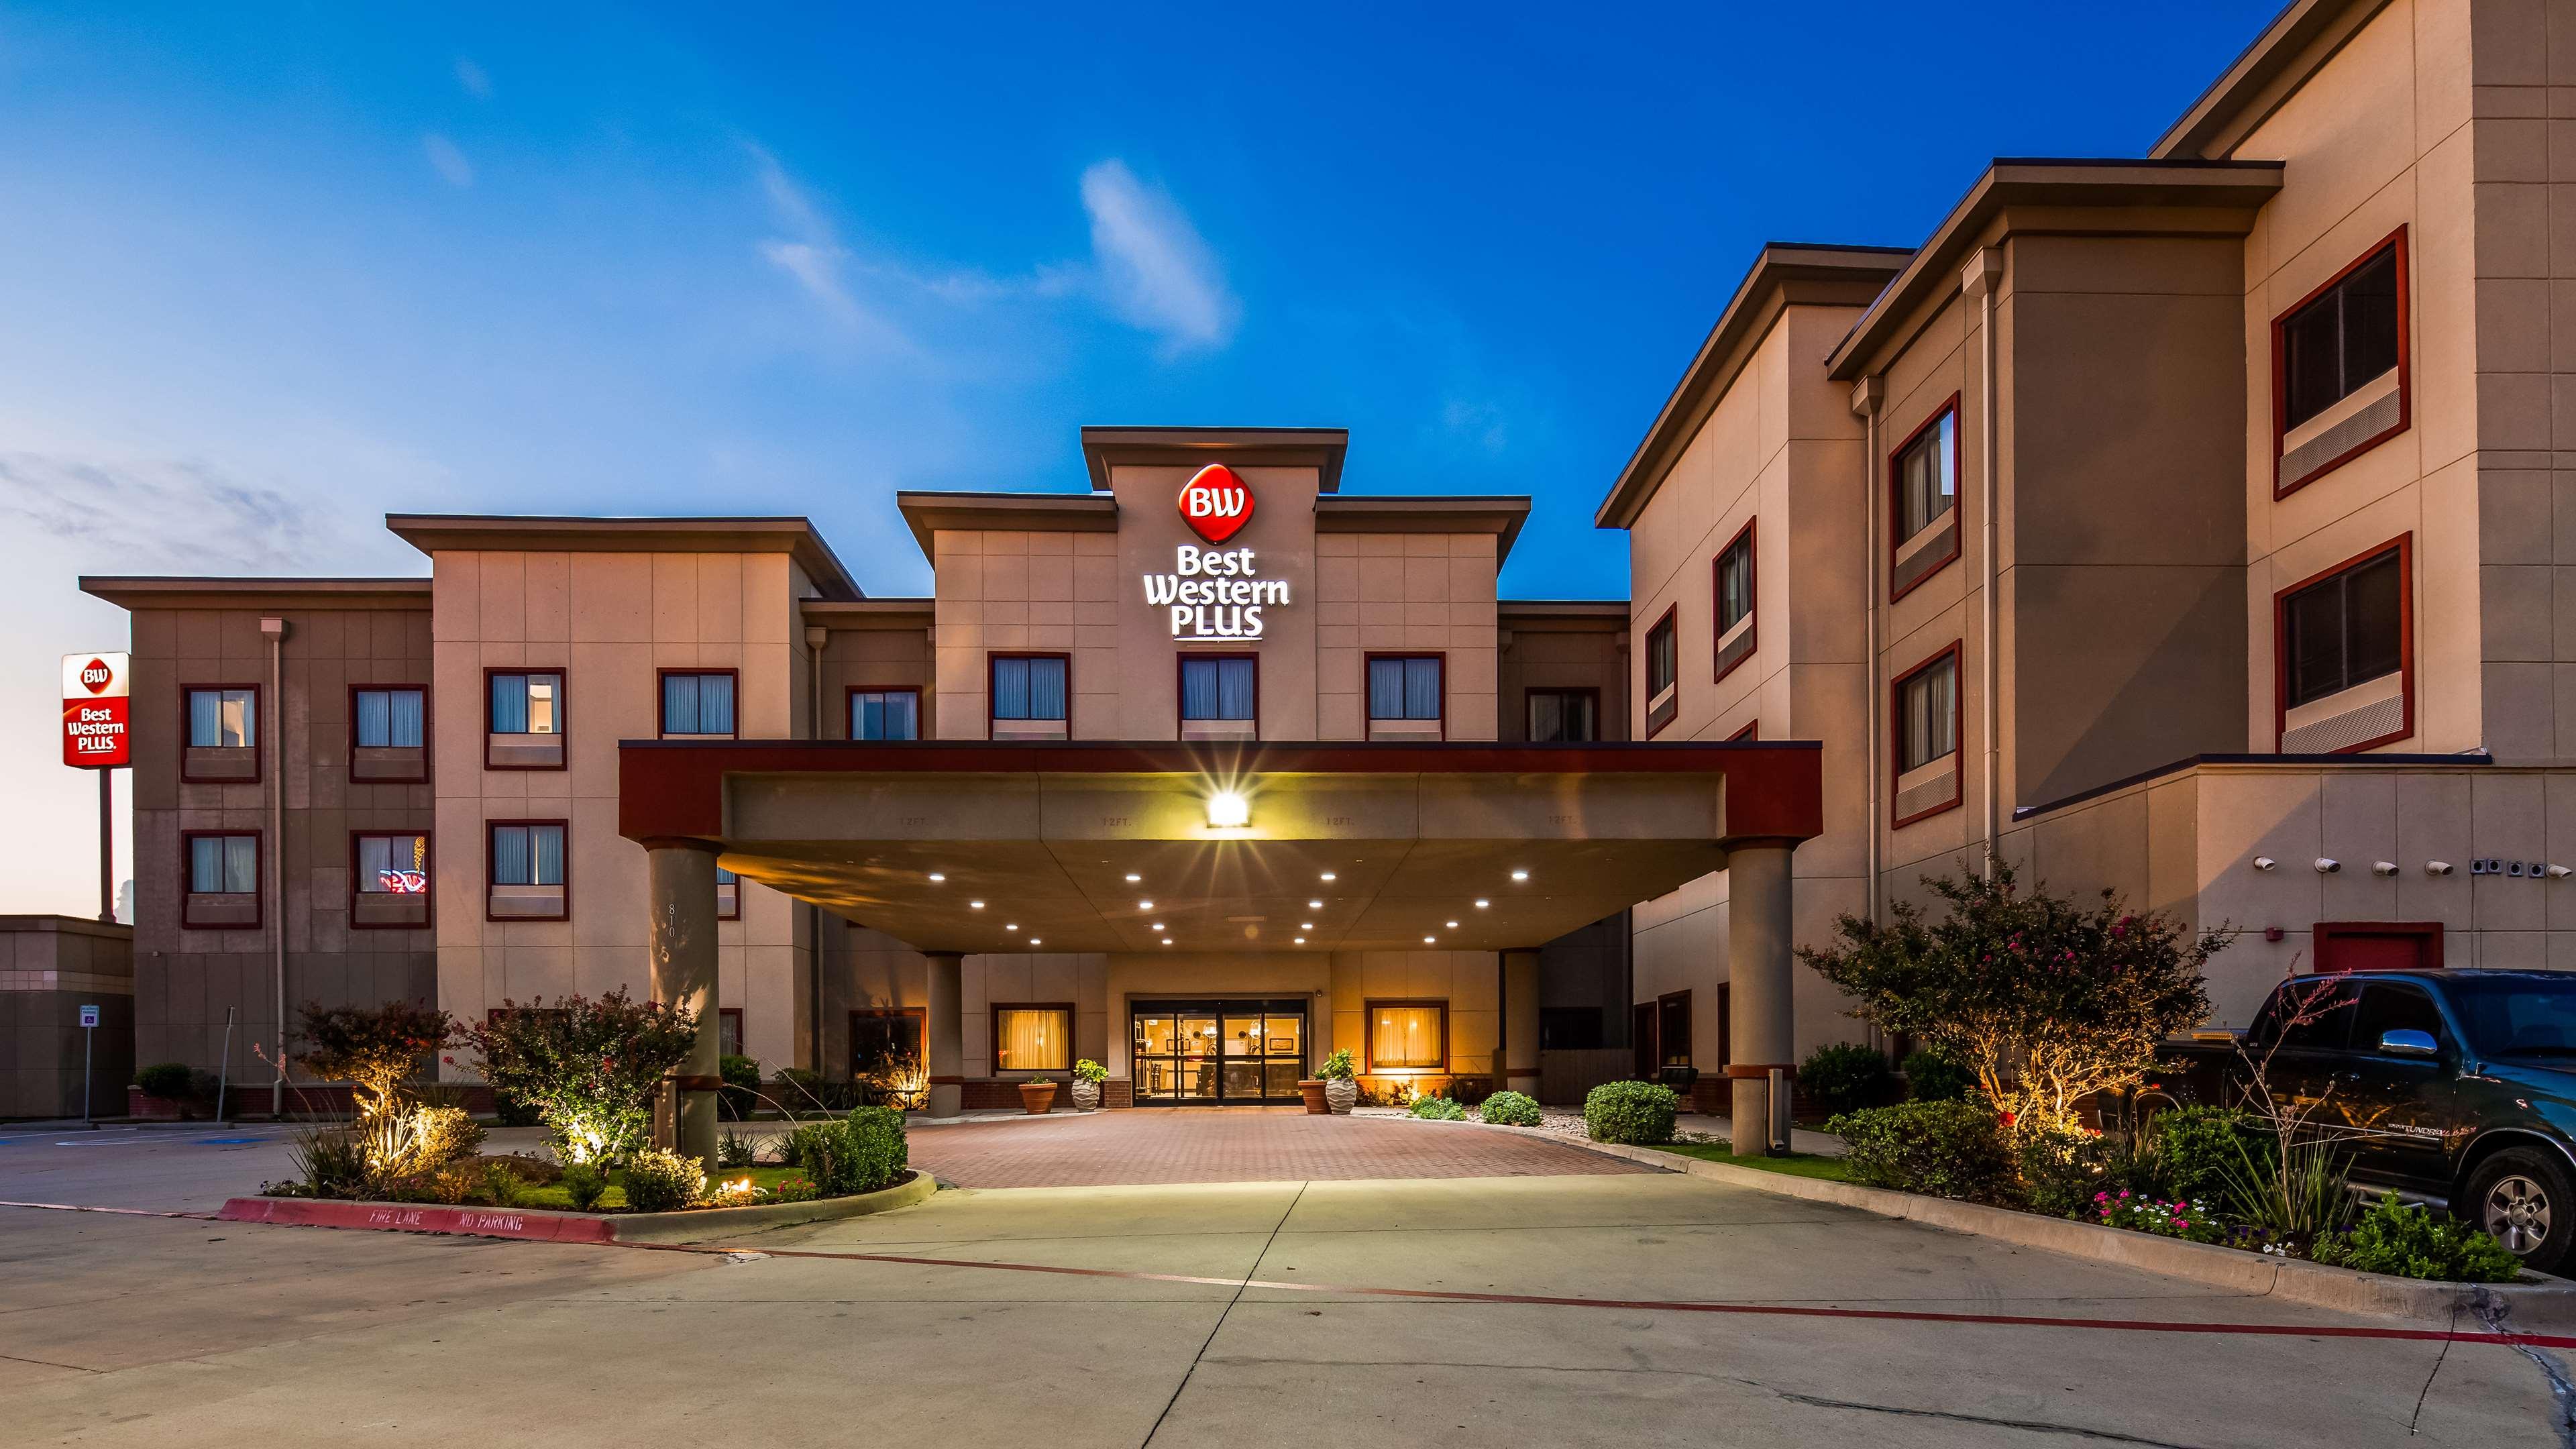 Best Western Plus Texoma Hotel & Suites image 0